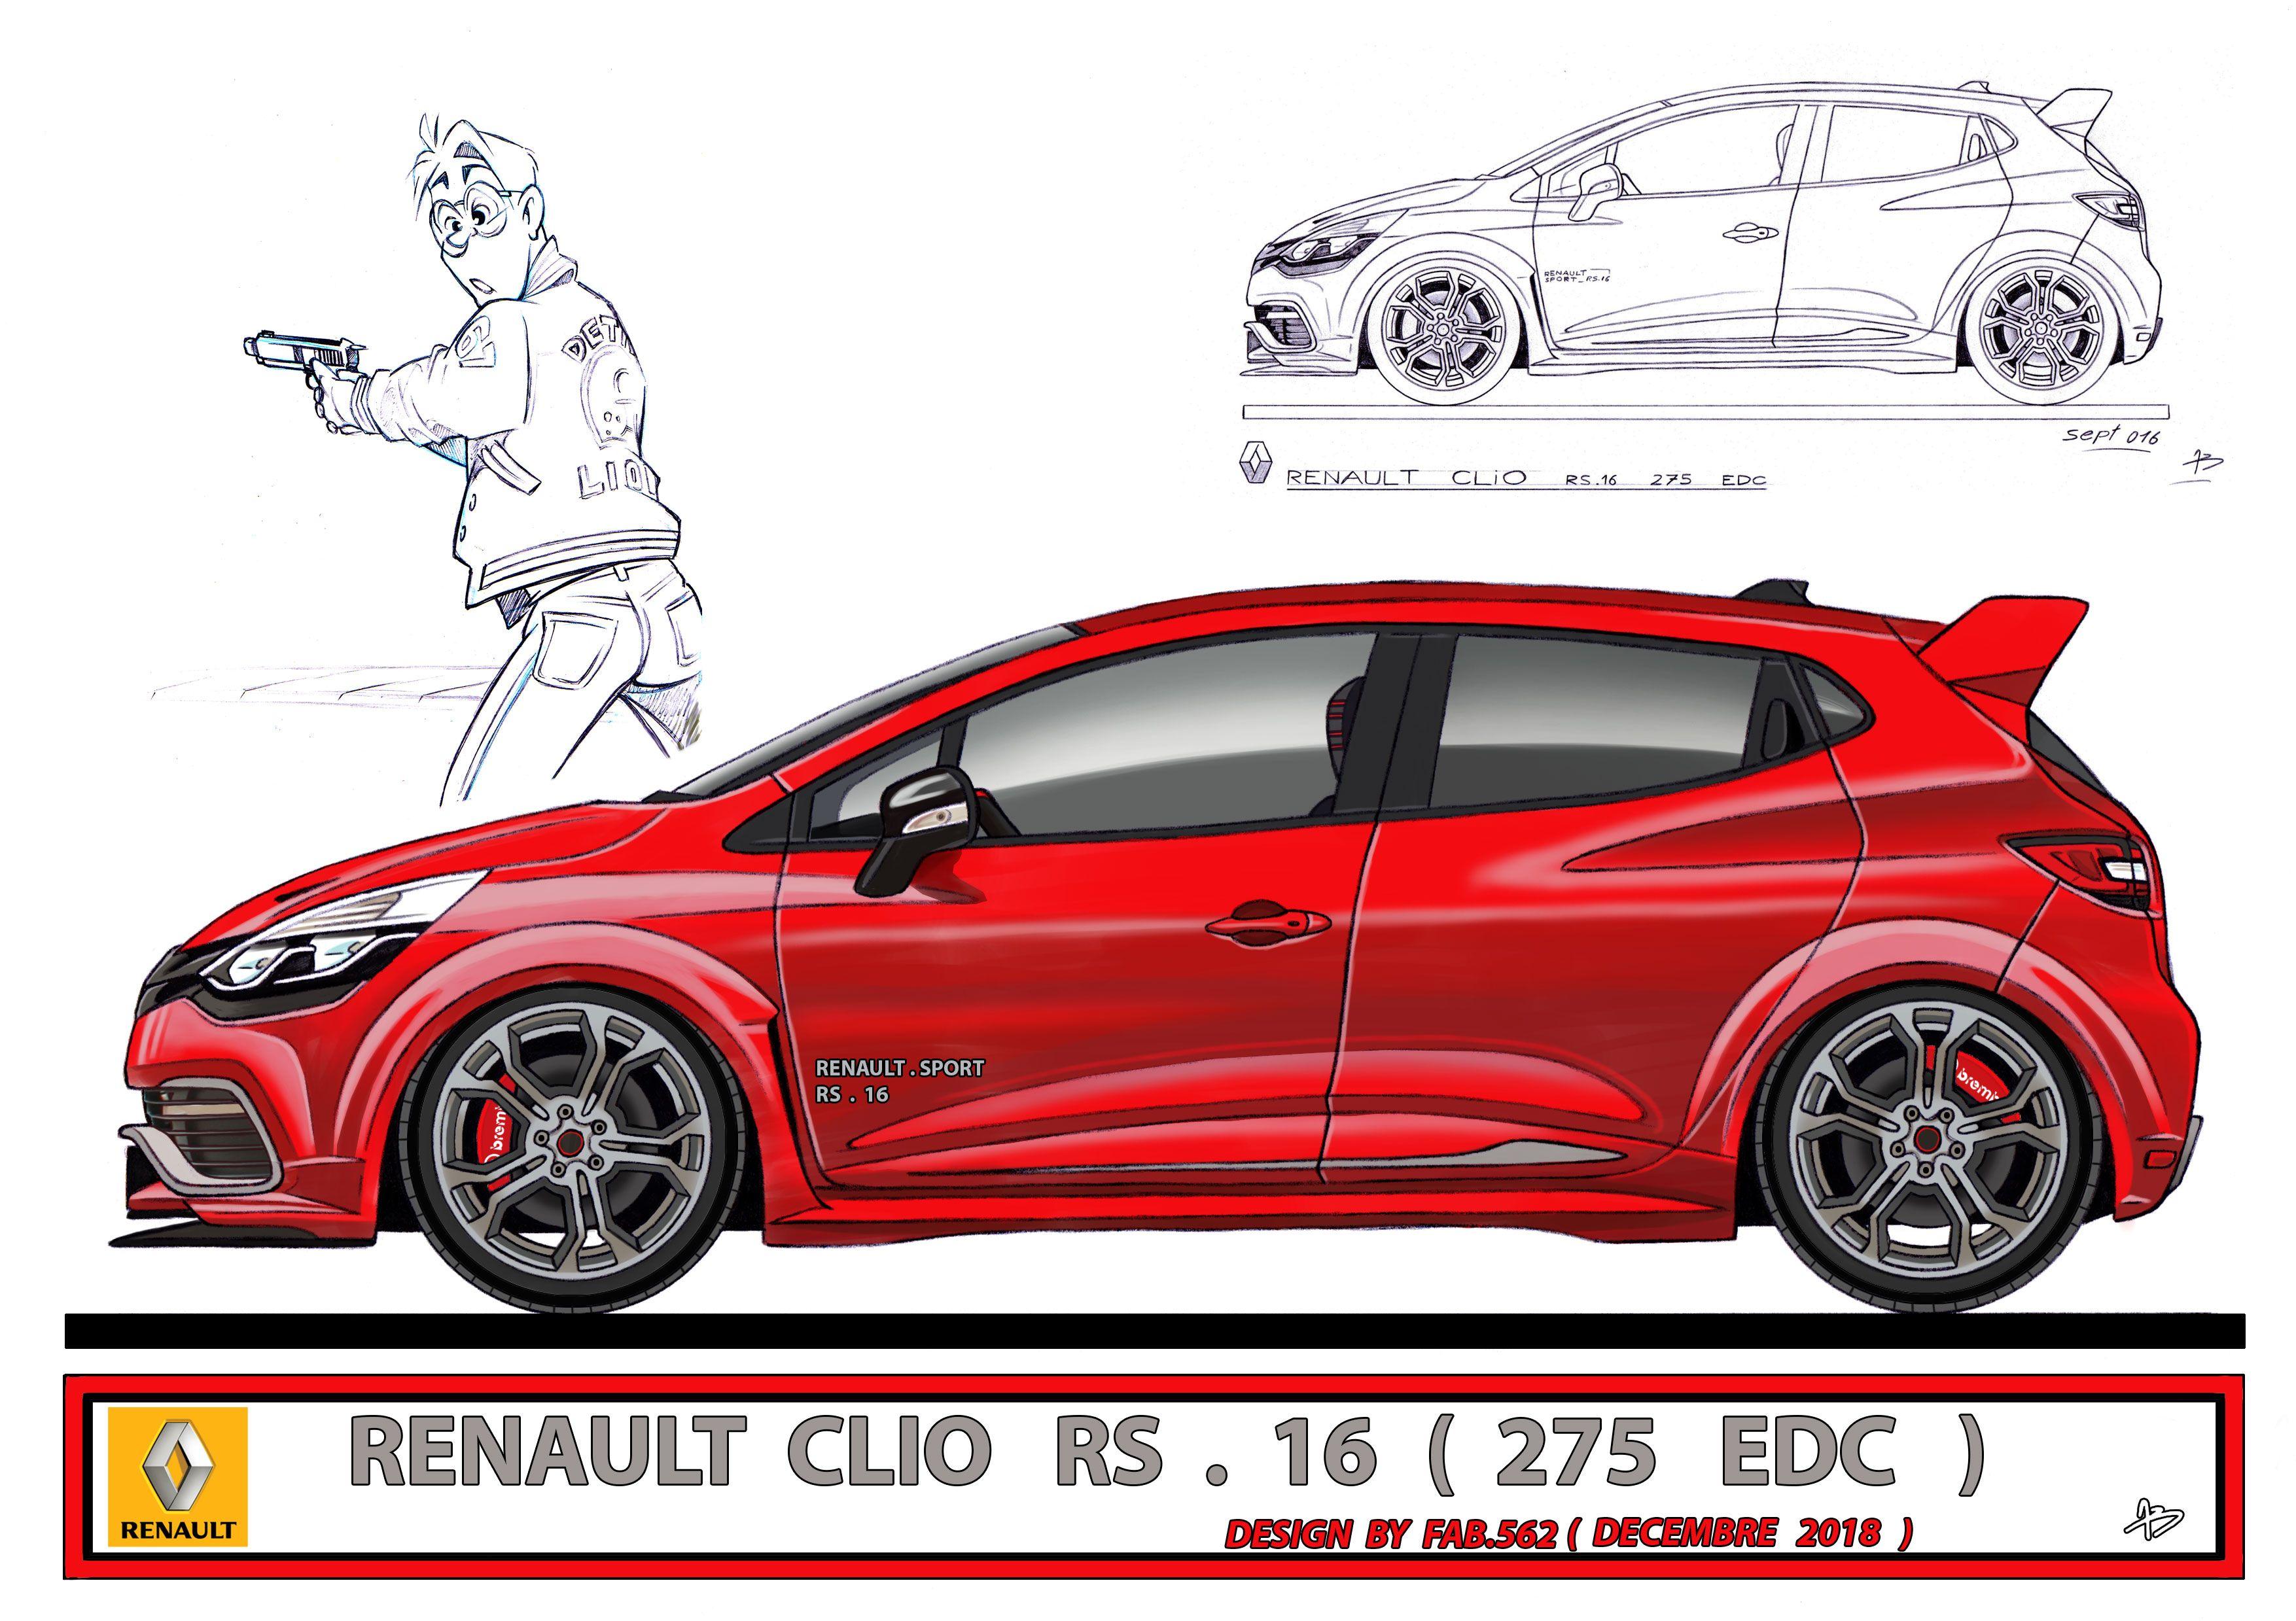 Renault Clio 4 Rs Renault Clio Clio Renault